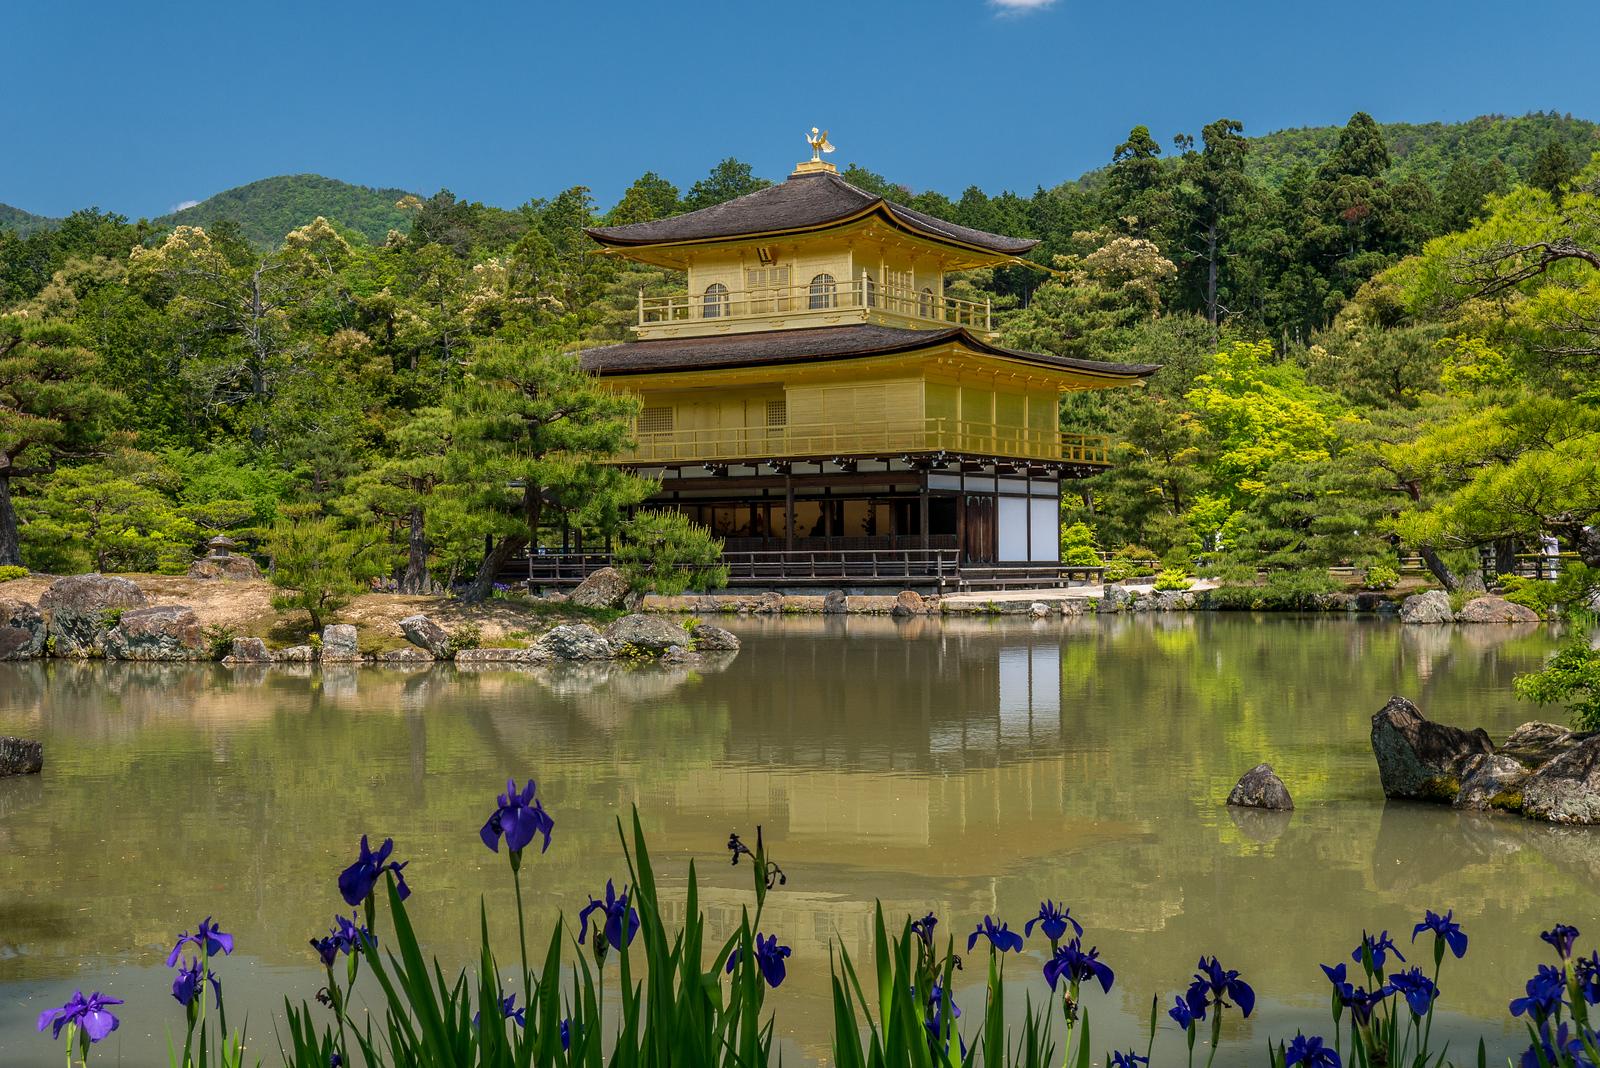 Kyoto's Golden Temple, Kinkaku-ji